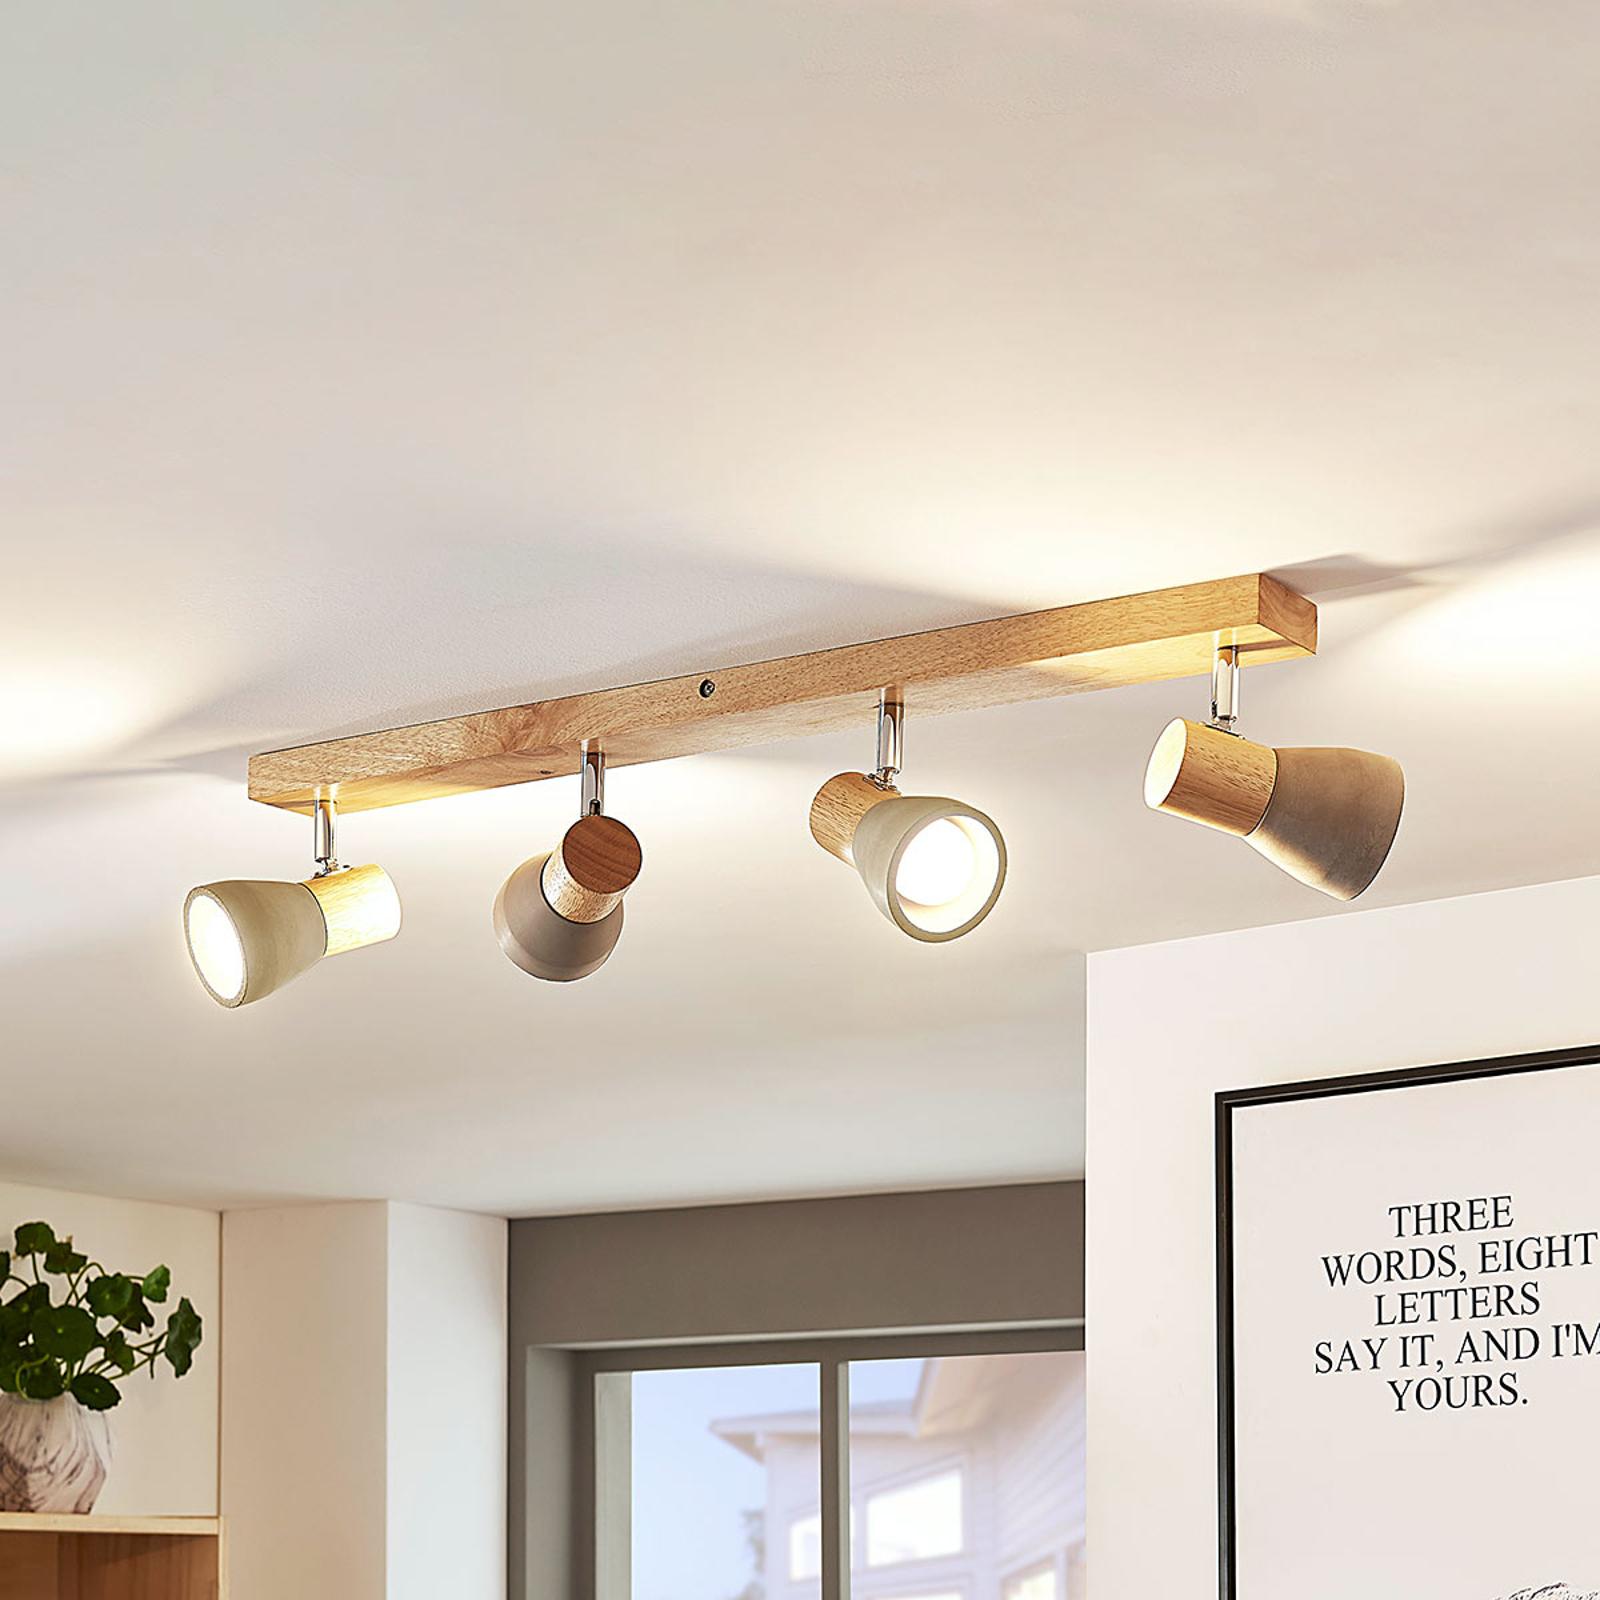 LED reflektor Filiz ze dřeva a betonu, 4bodový